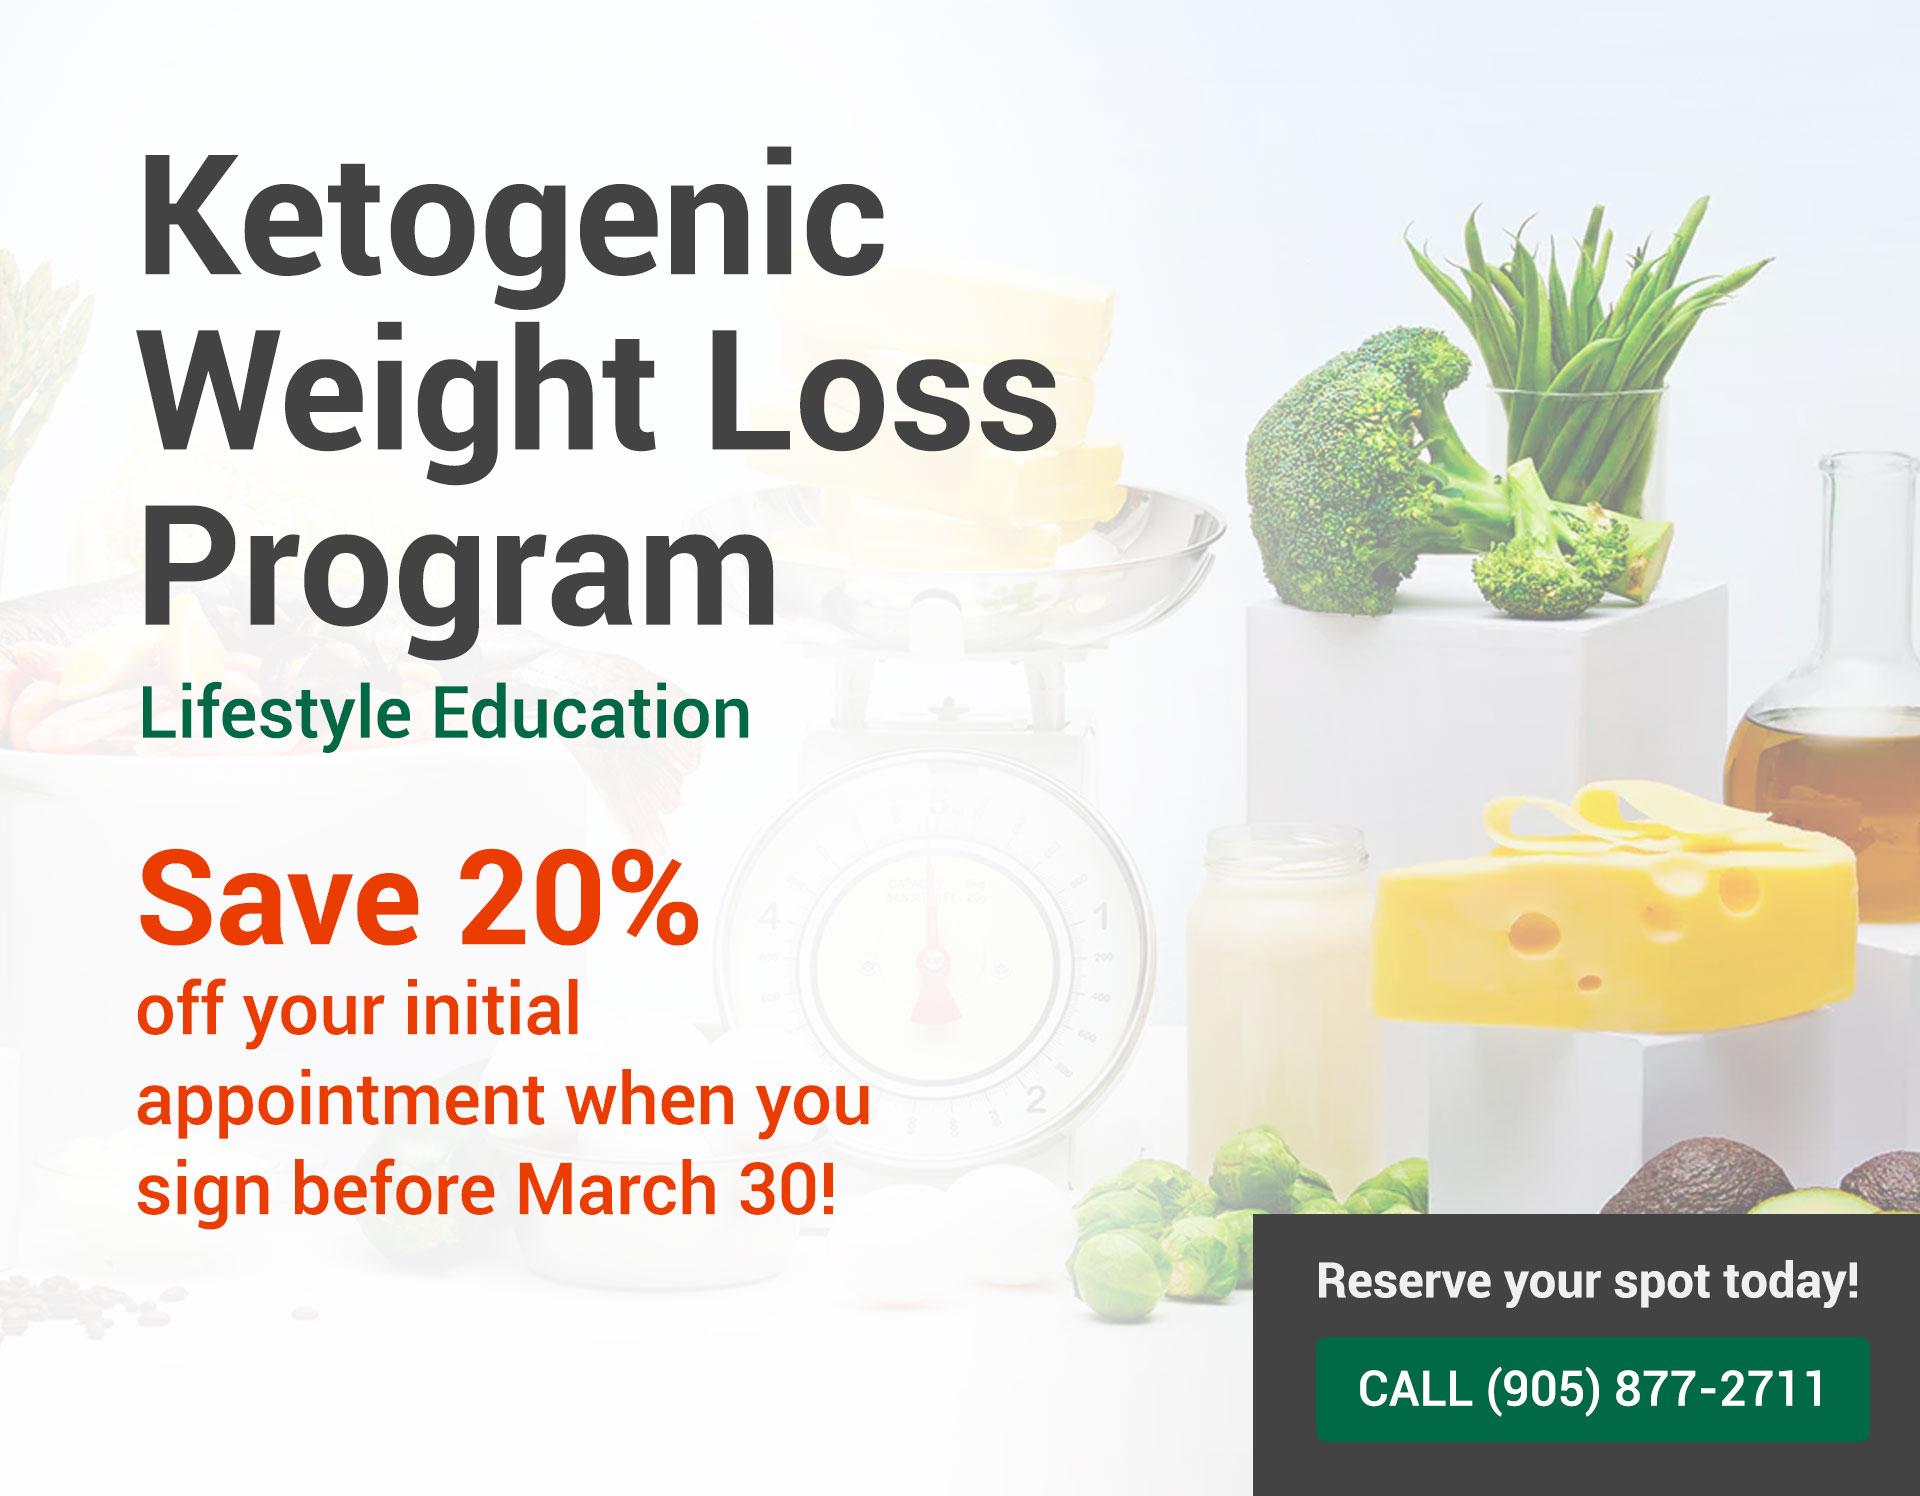 Ketogenic Weight Loss Program